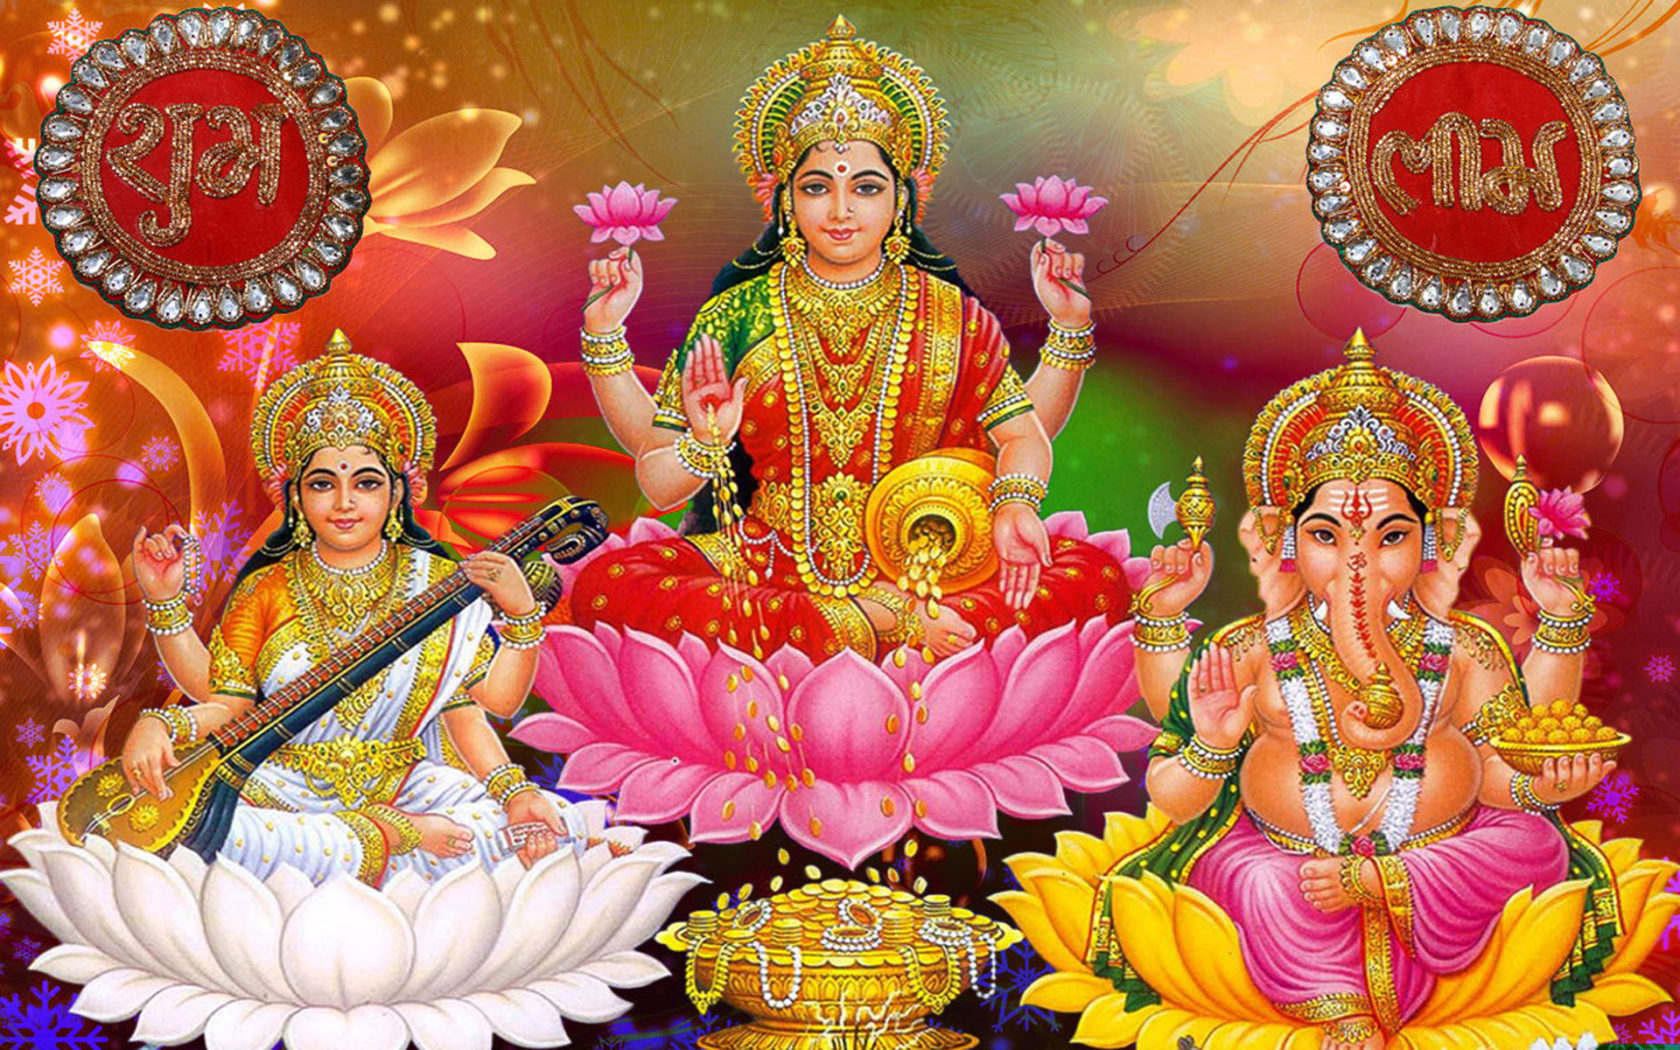 Laxmi Wallpaper Hd Laxmi Ganesh Wallpapers Beautiful Images Free Download